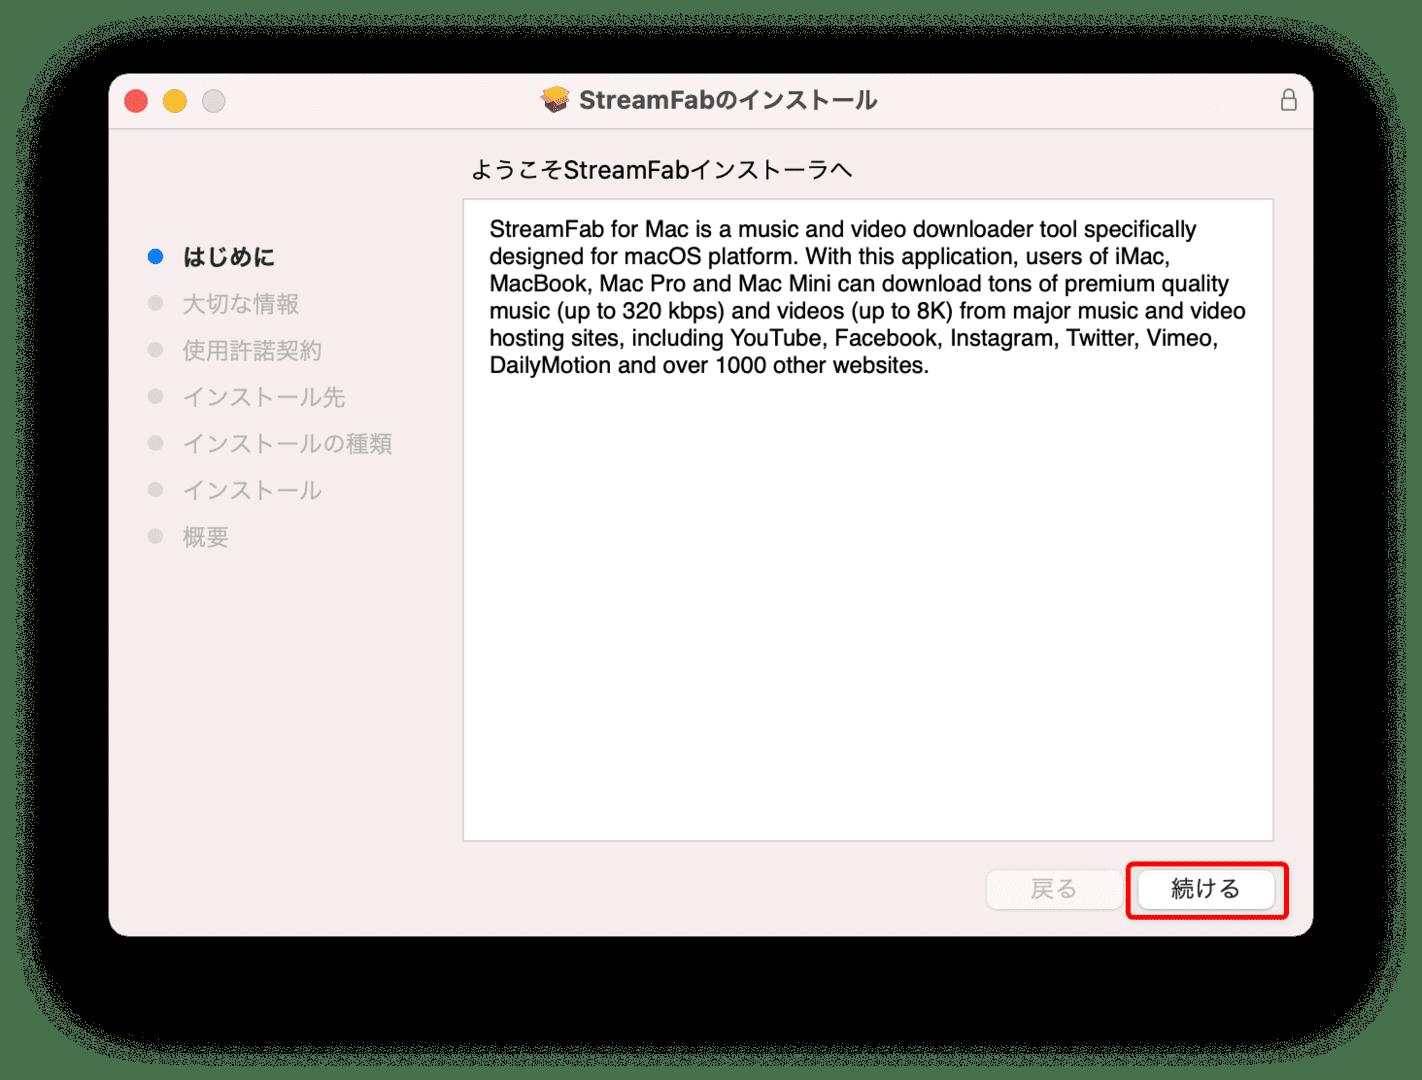 【Mac版アマゾンプライムビデオを録画する】動画をバレずに録画&保存!!Amazonプライムビデオの画面録画方法Mac版|録画した動画はスマホでも再生可能!|録画方法:インストール画面が表示されたら使用許諾契約の項目まで「続ける」をクリックしましょう。